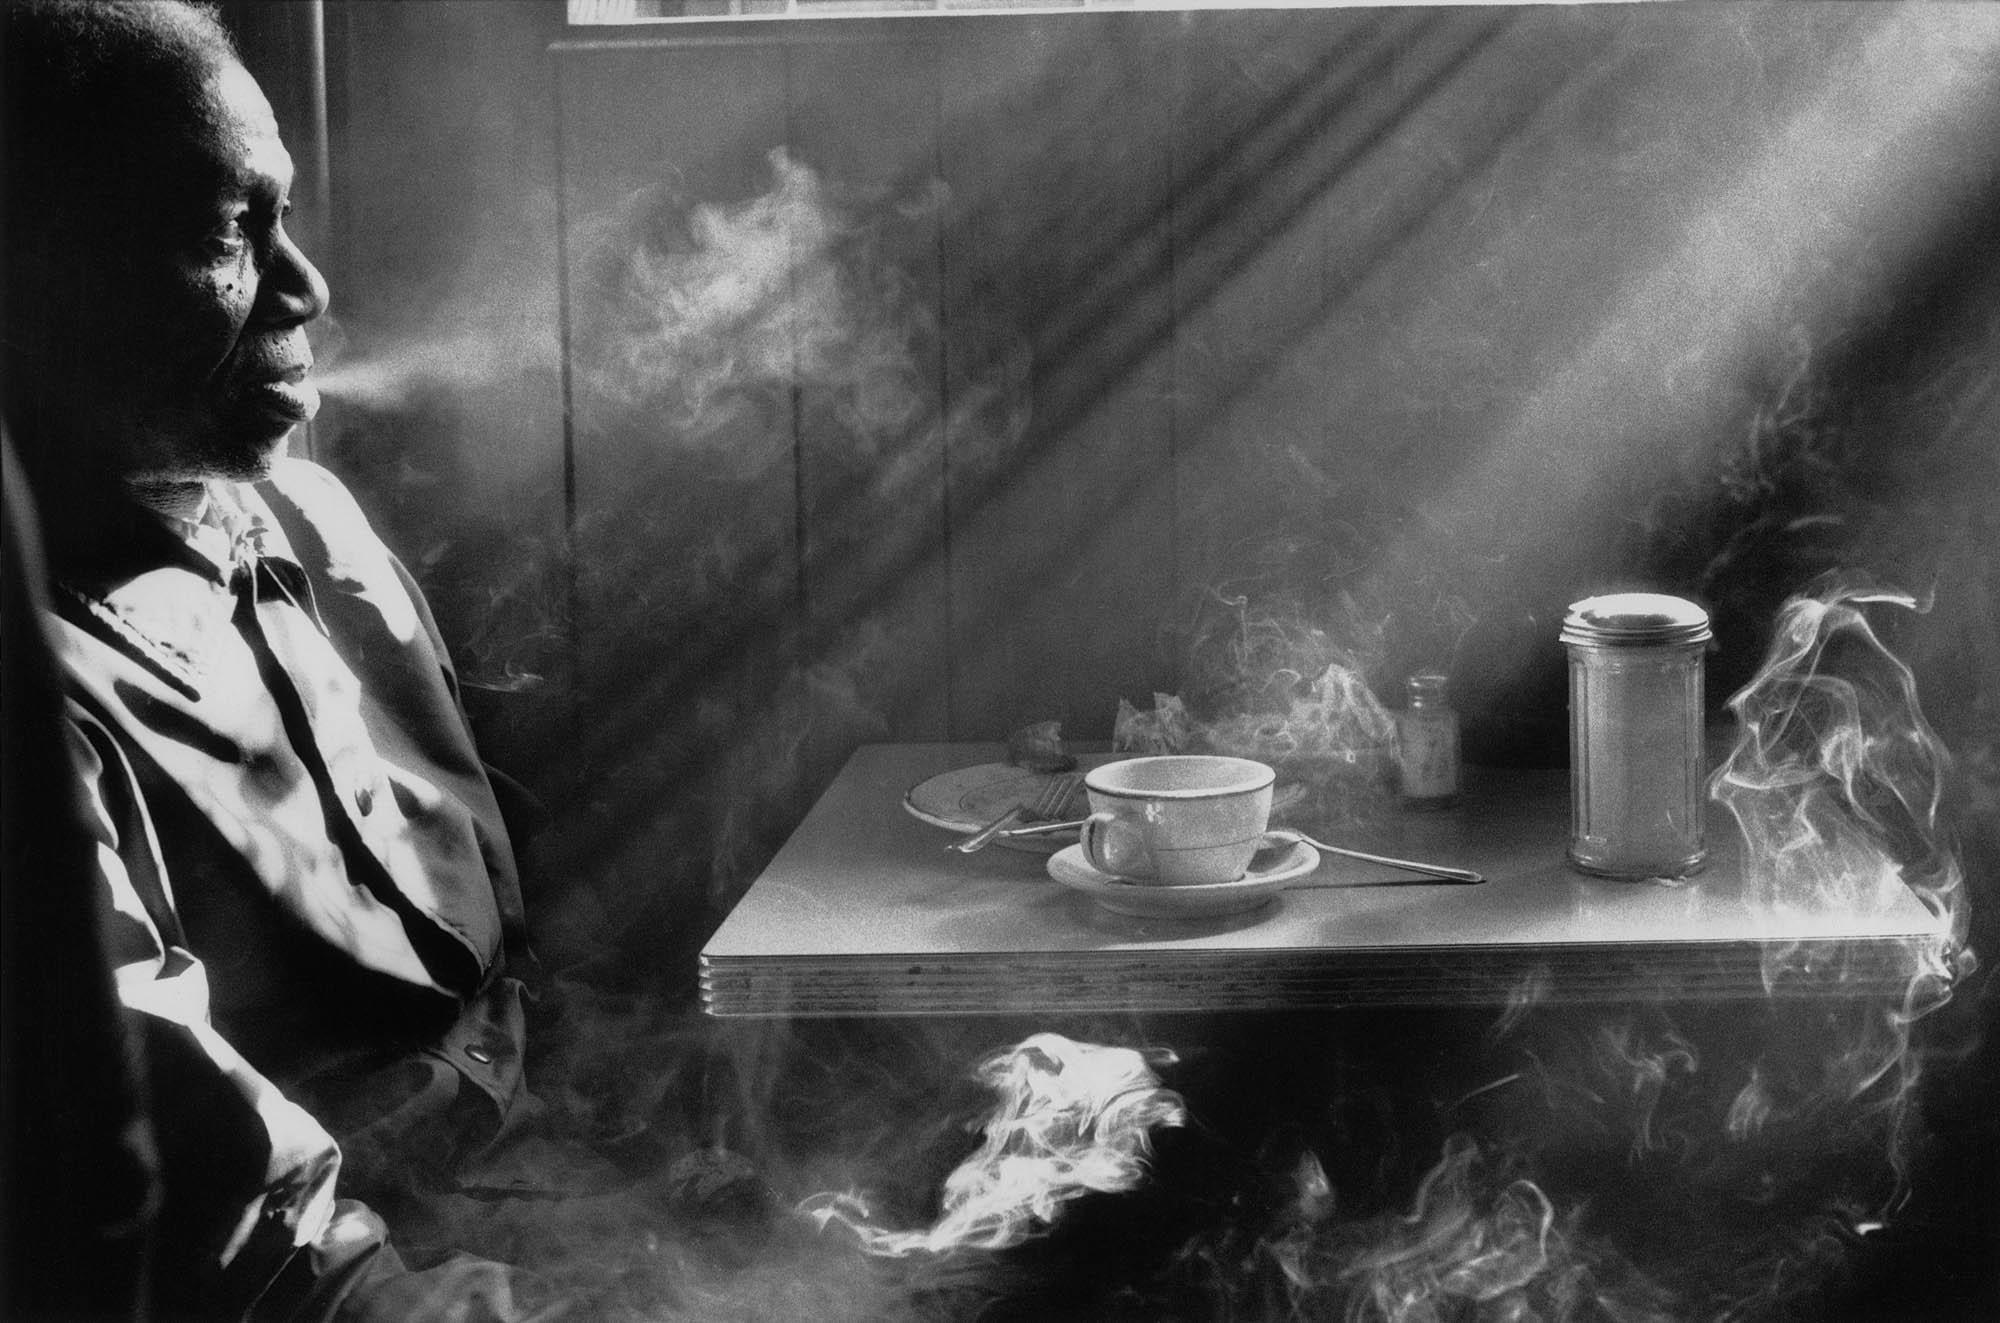 Copy of Man Smoking in Diner (New York, NY), 1974